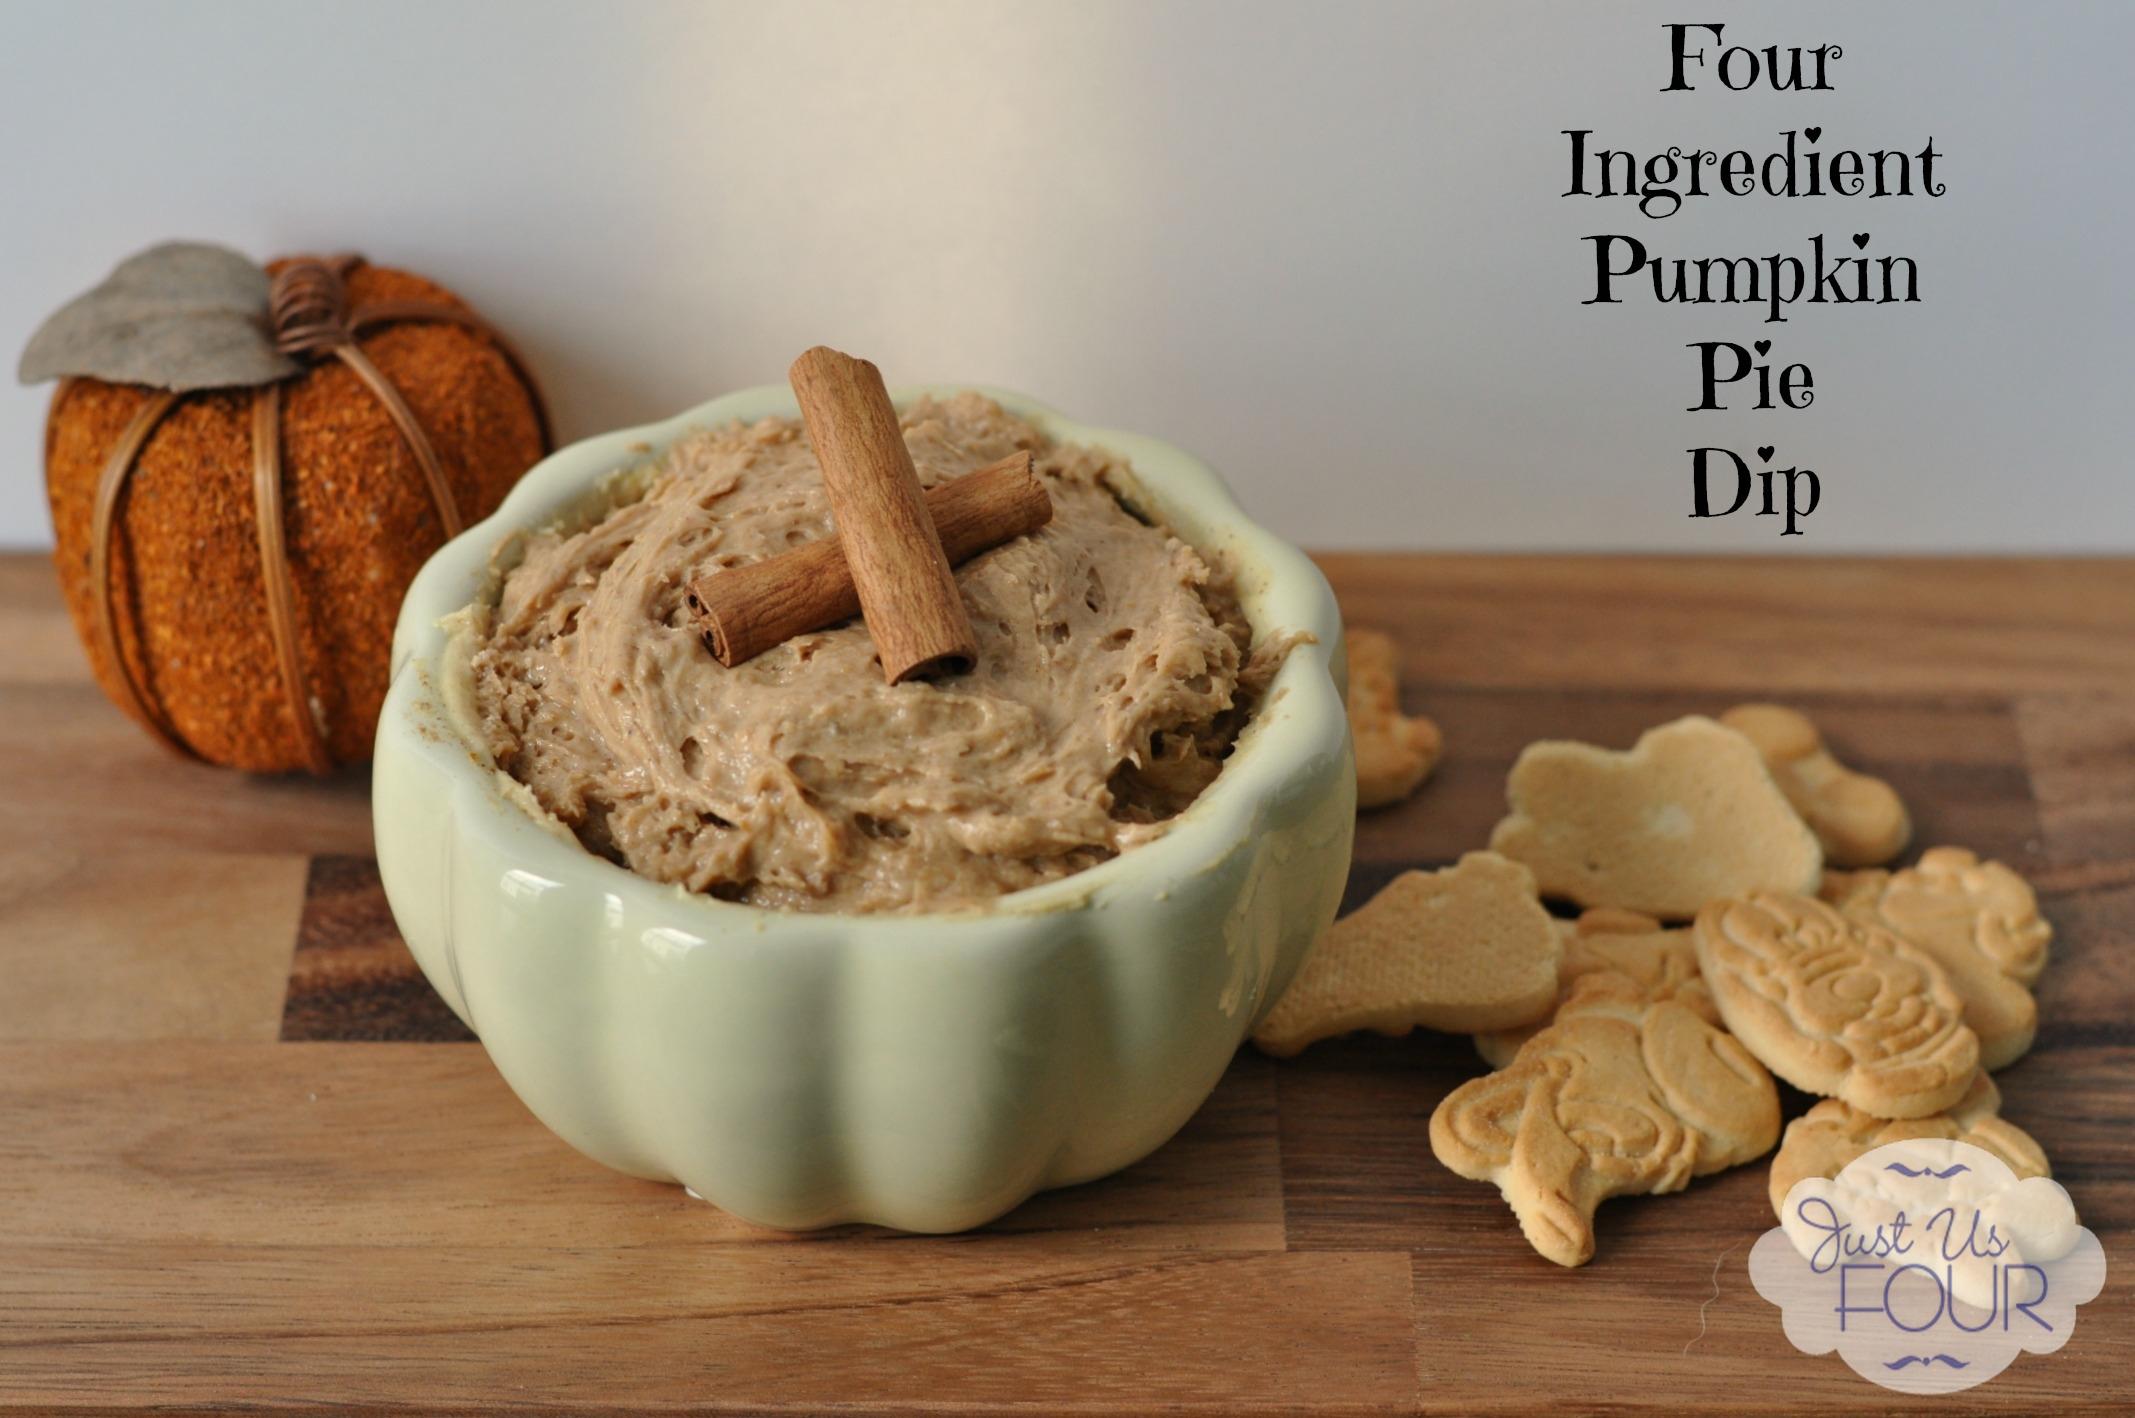 Four Ingredient Pumpkin Pie Dip - Just Us Four